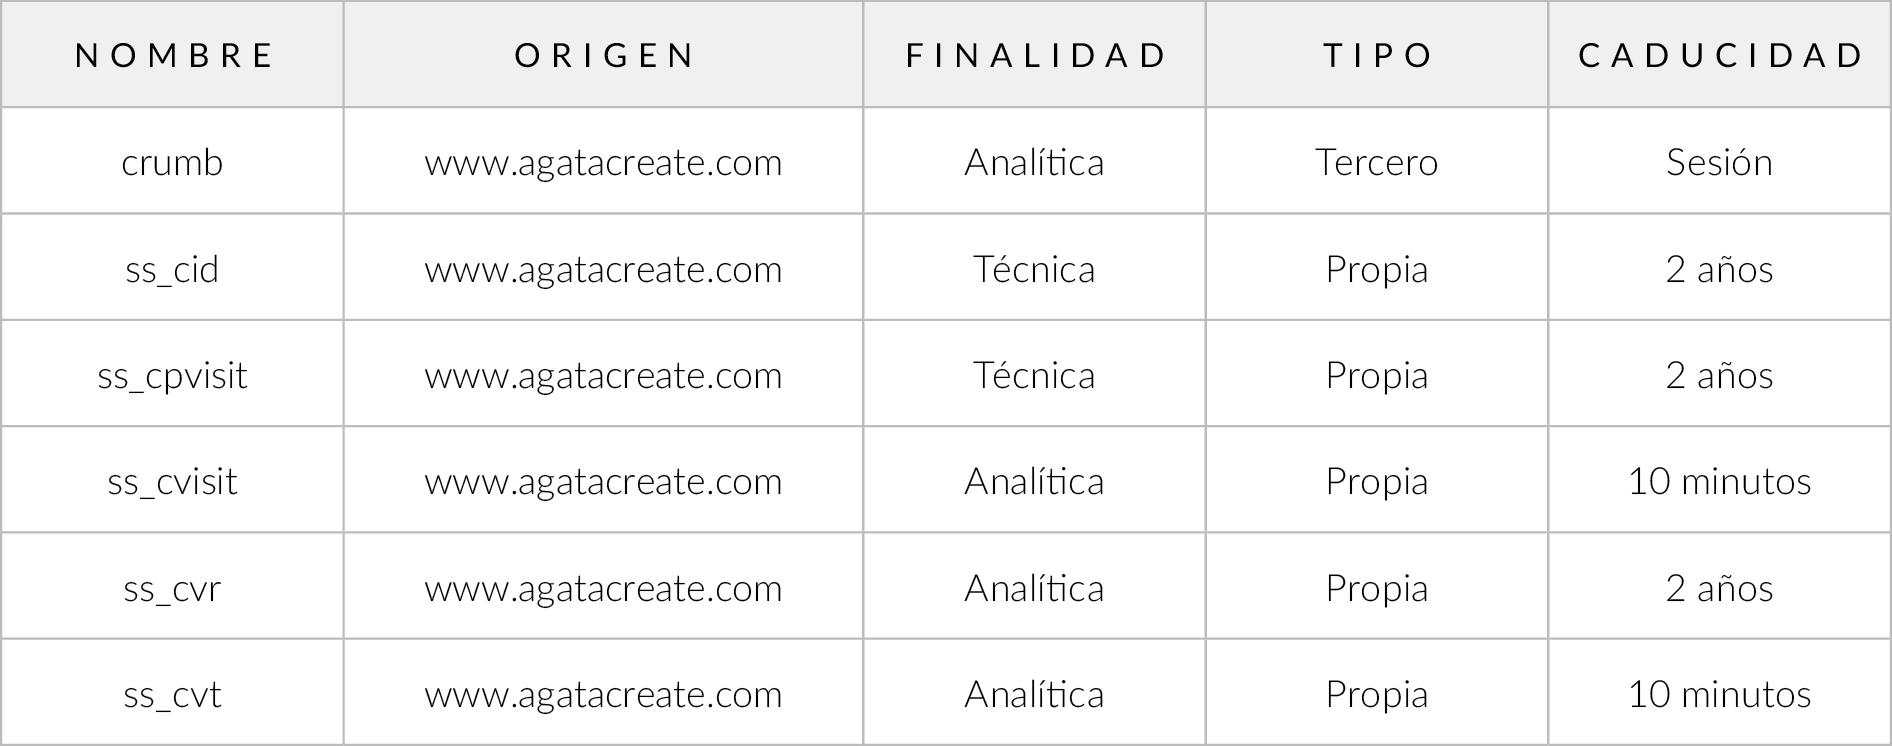 disclaimer_tabelle_es.jpg